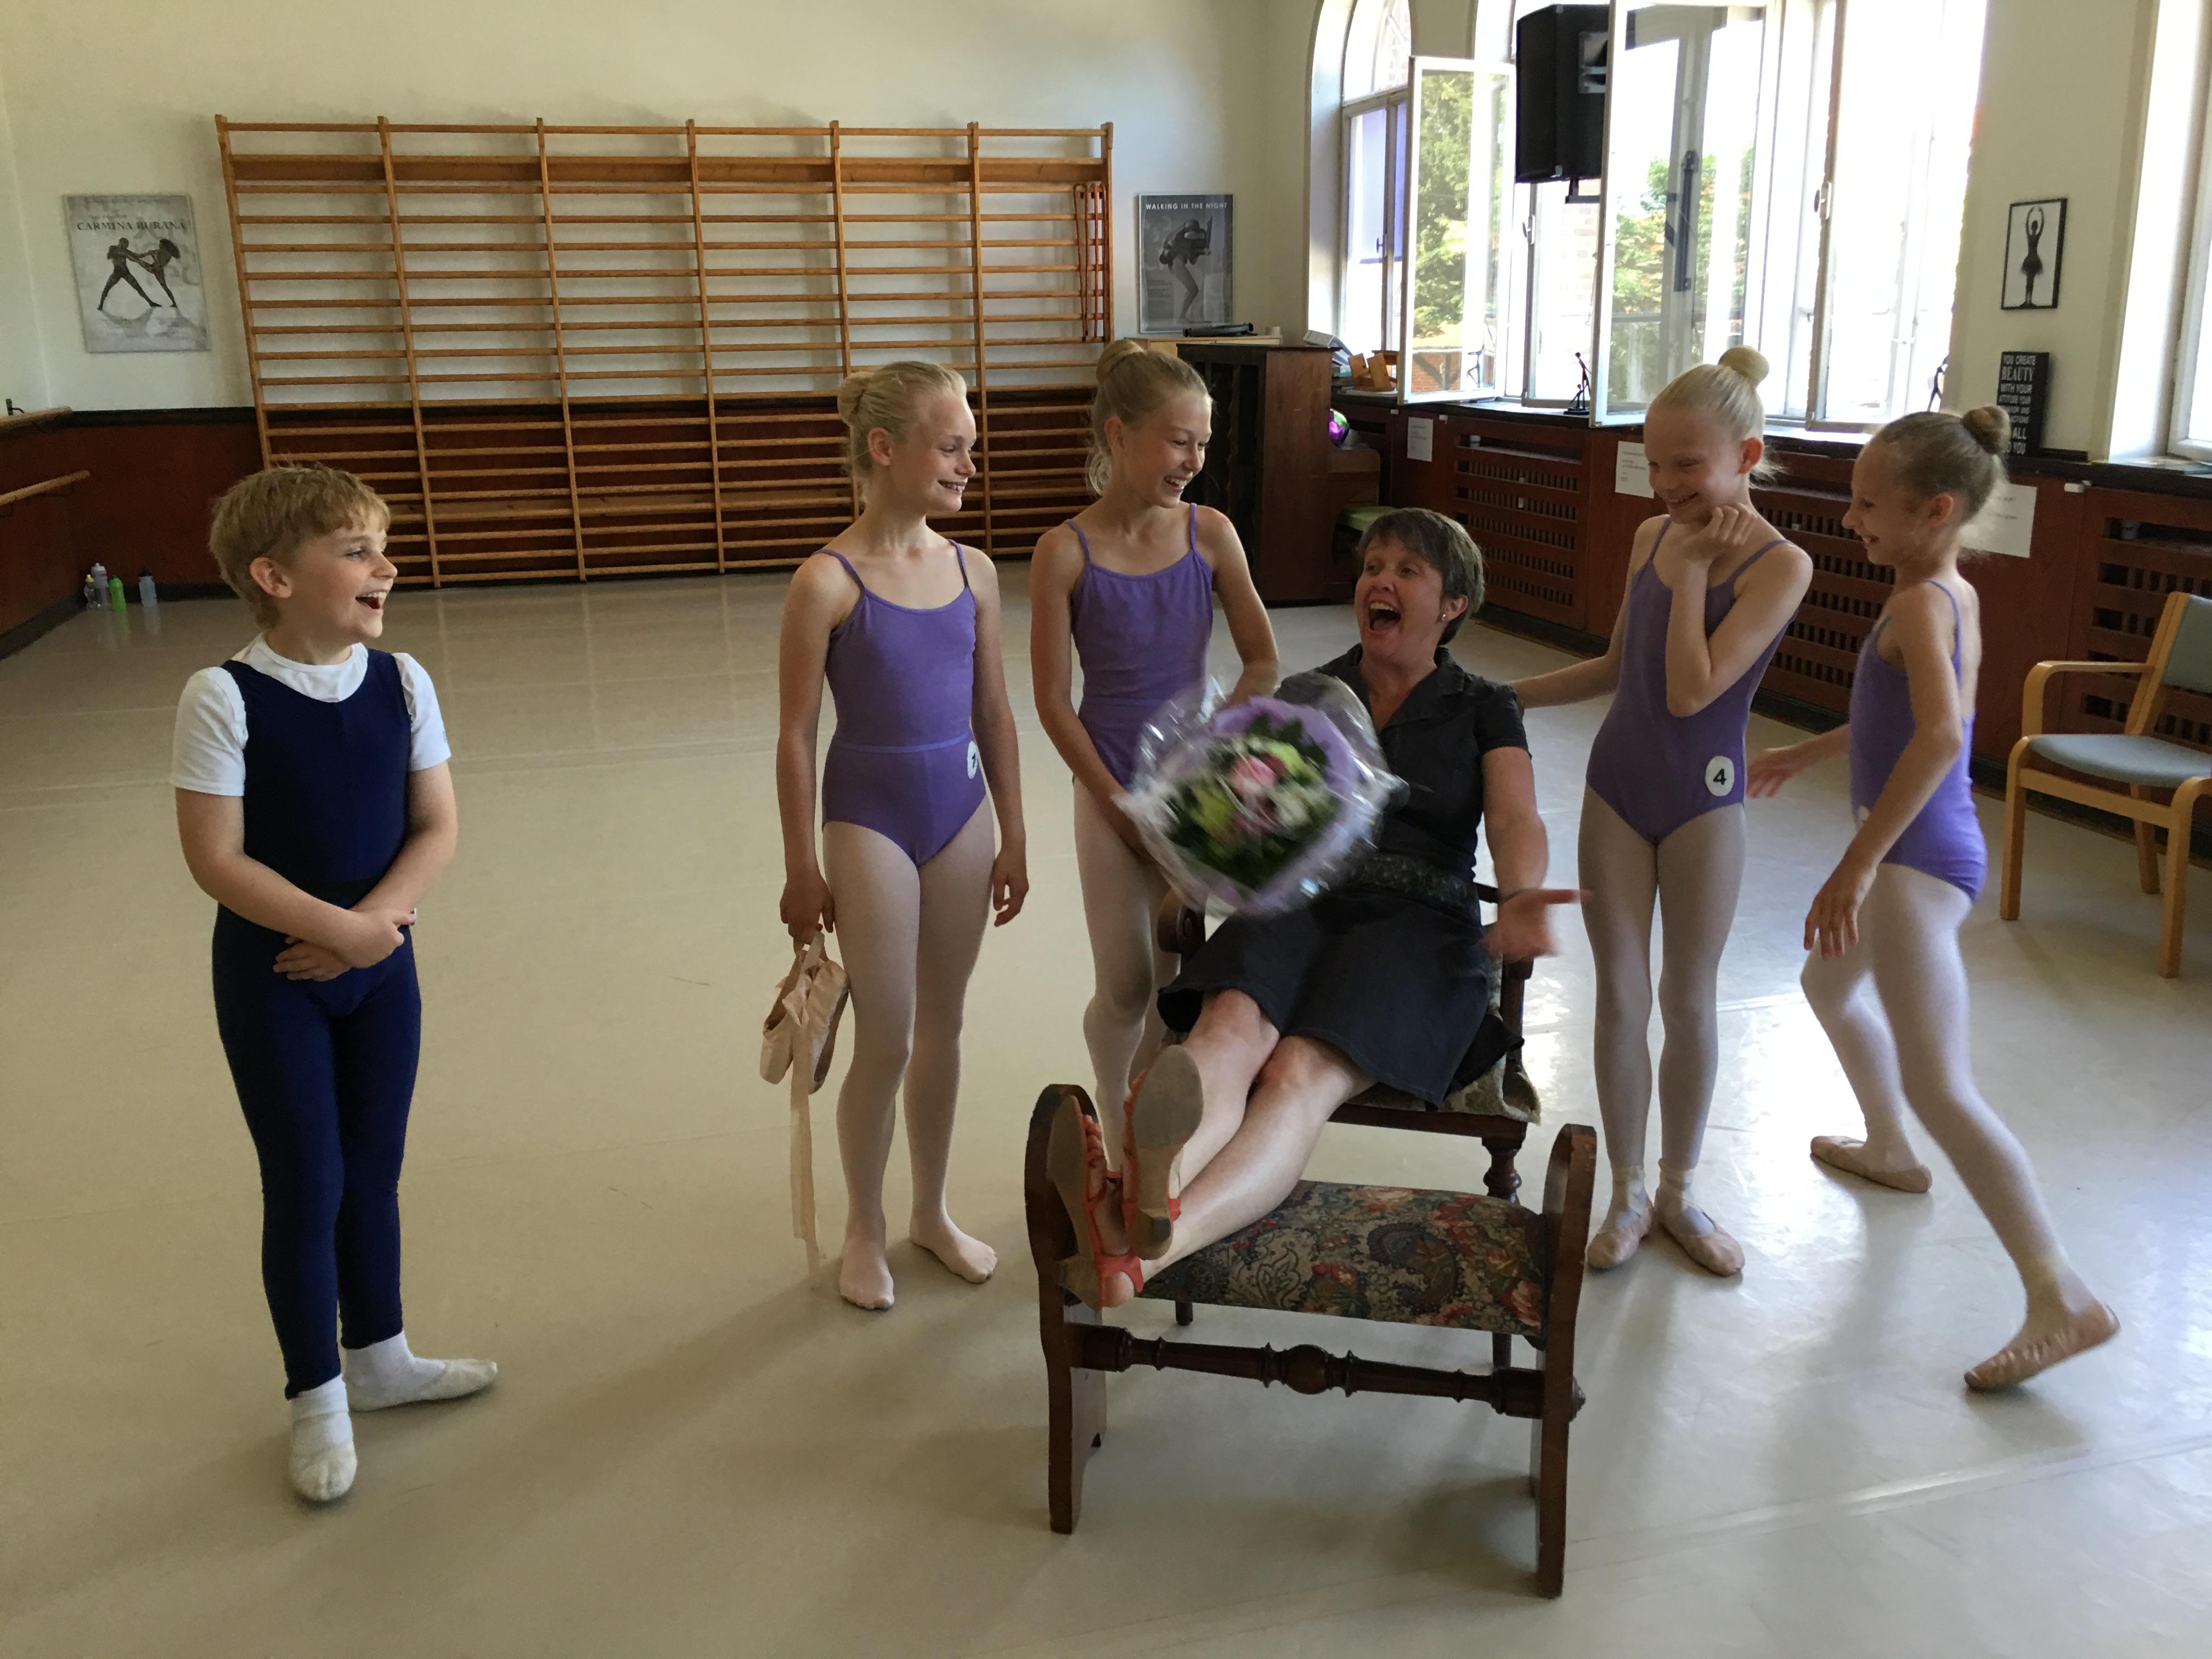 Fem lokale balletbørn bestod deres eksamen | SønderborgNYT